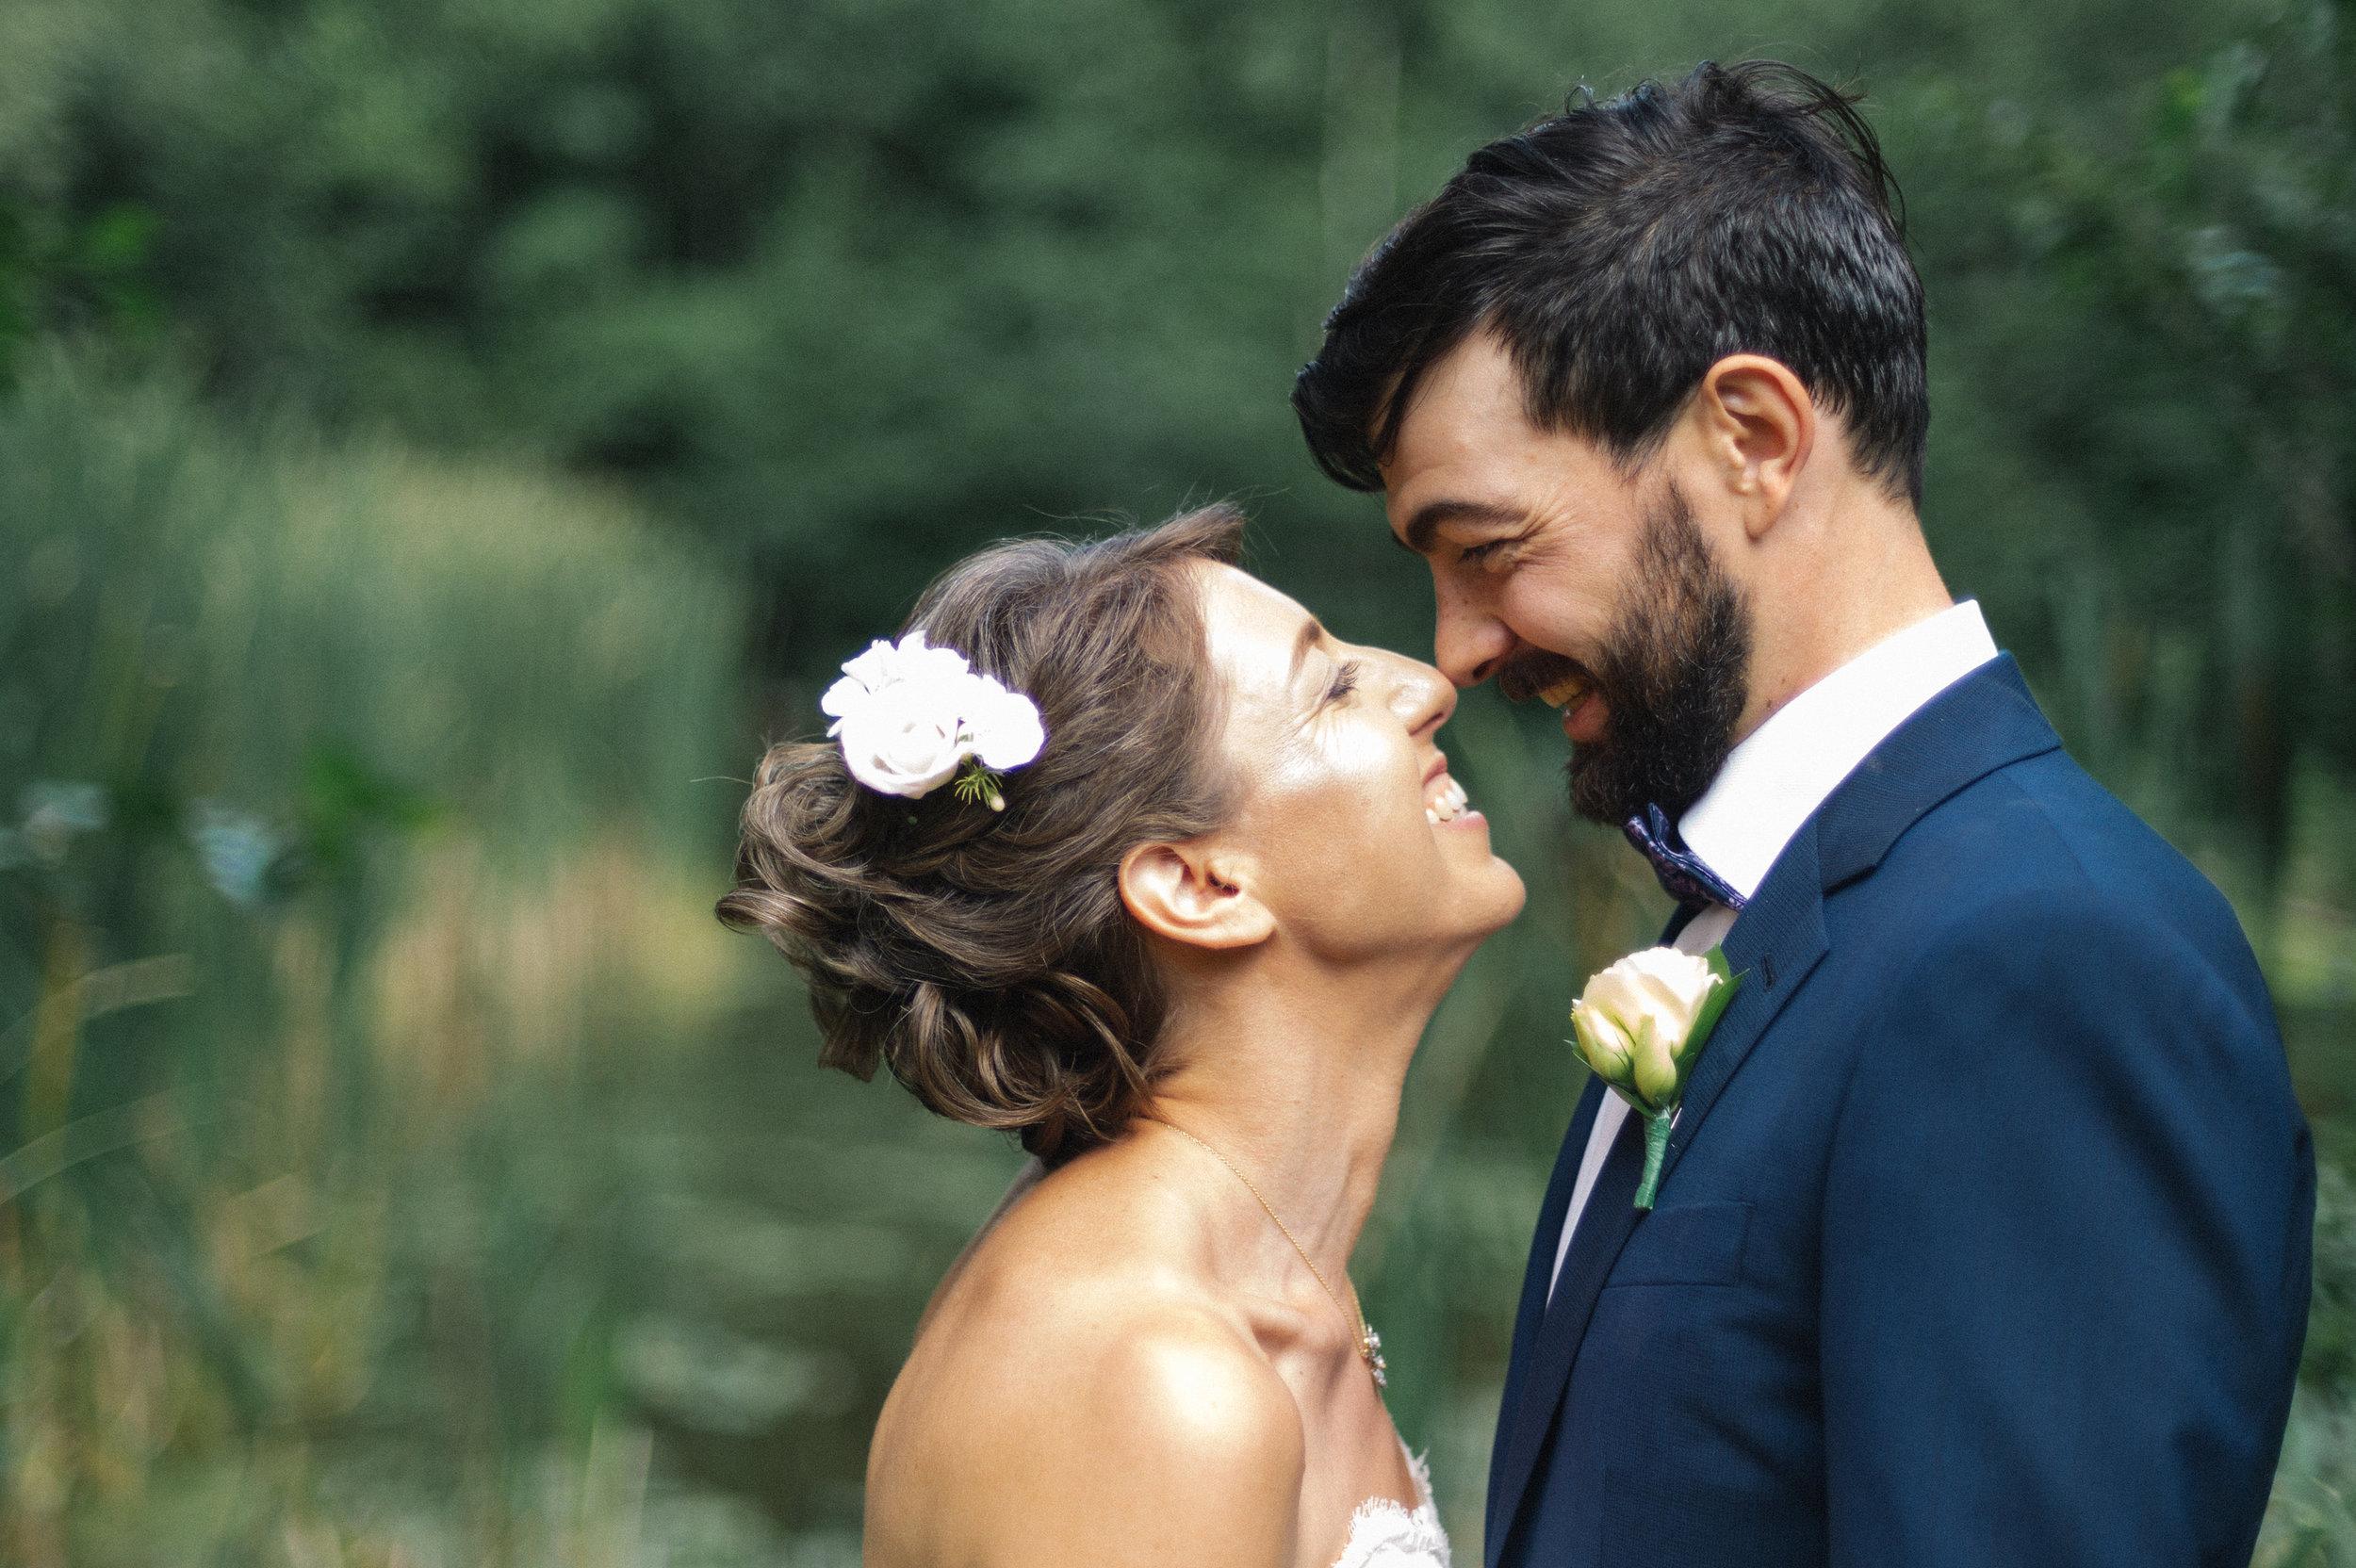 Daniela & Pieter - Private backyard wedding